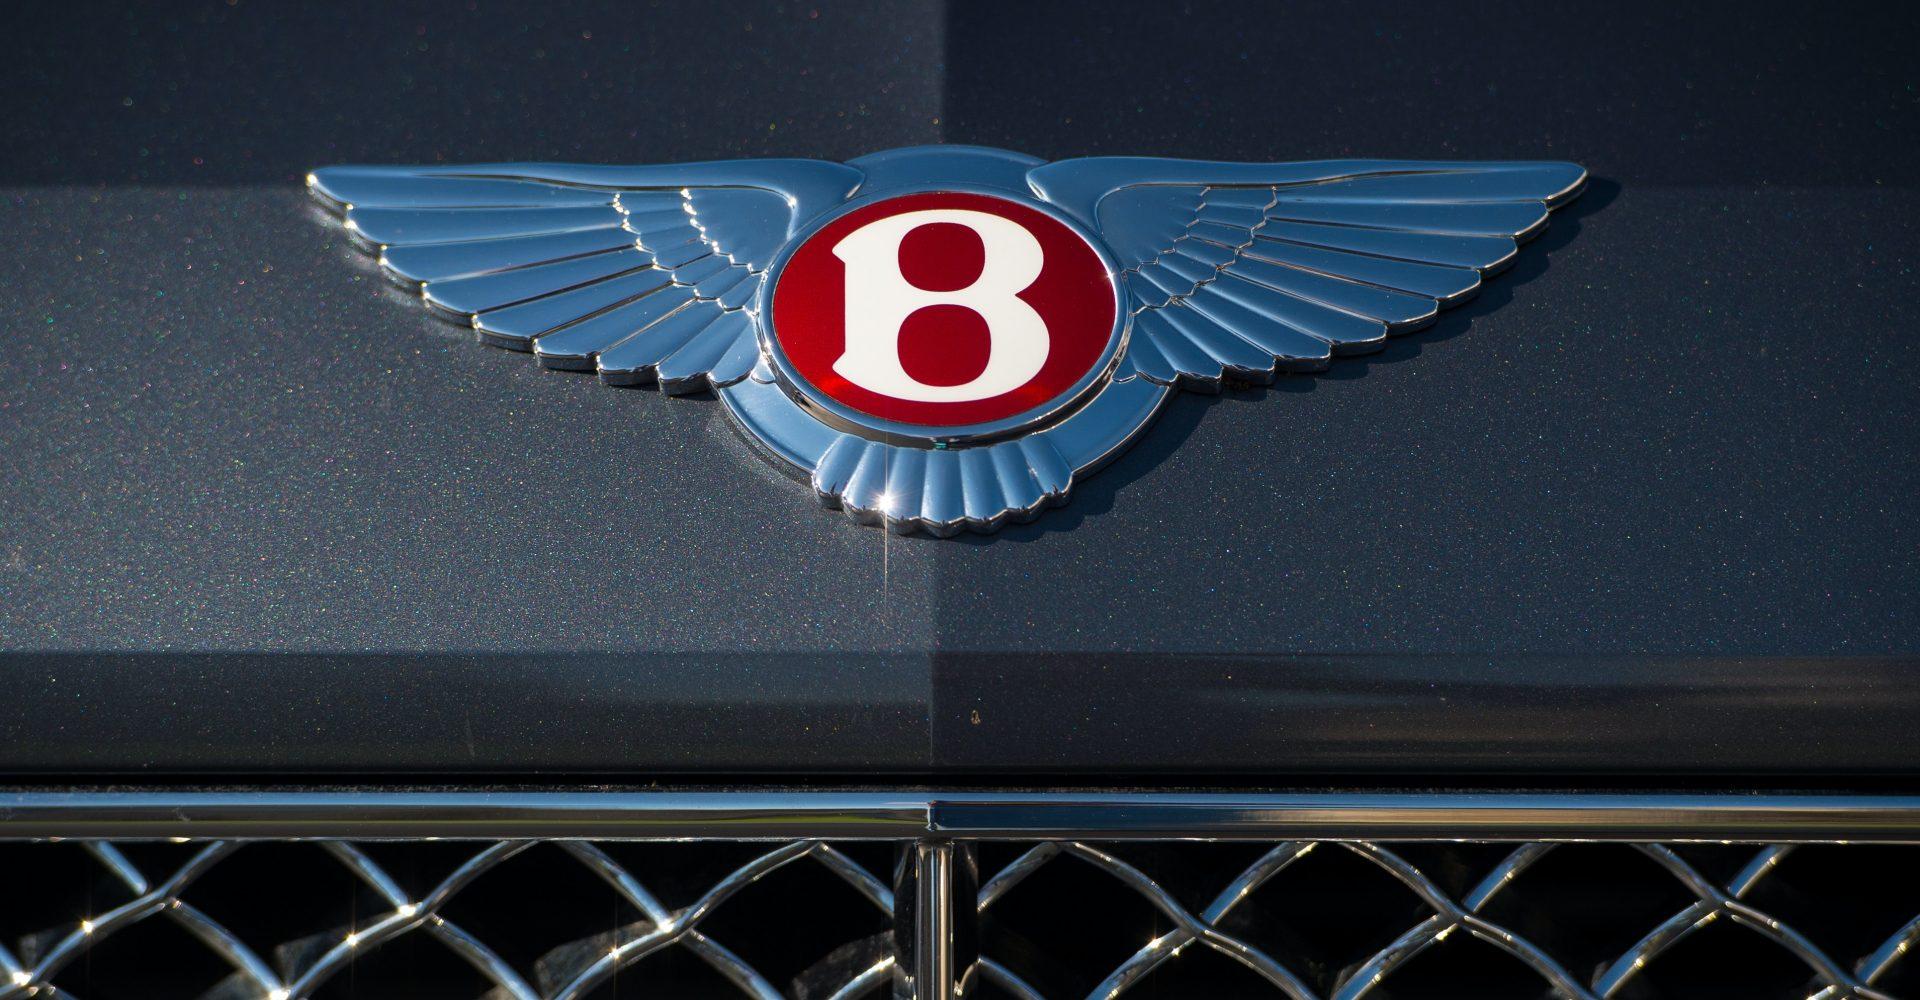 Bentley to cut up to 1,000 jobs under voluntary release programme